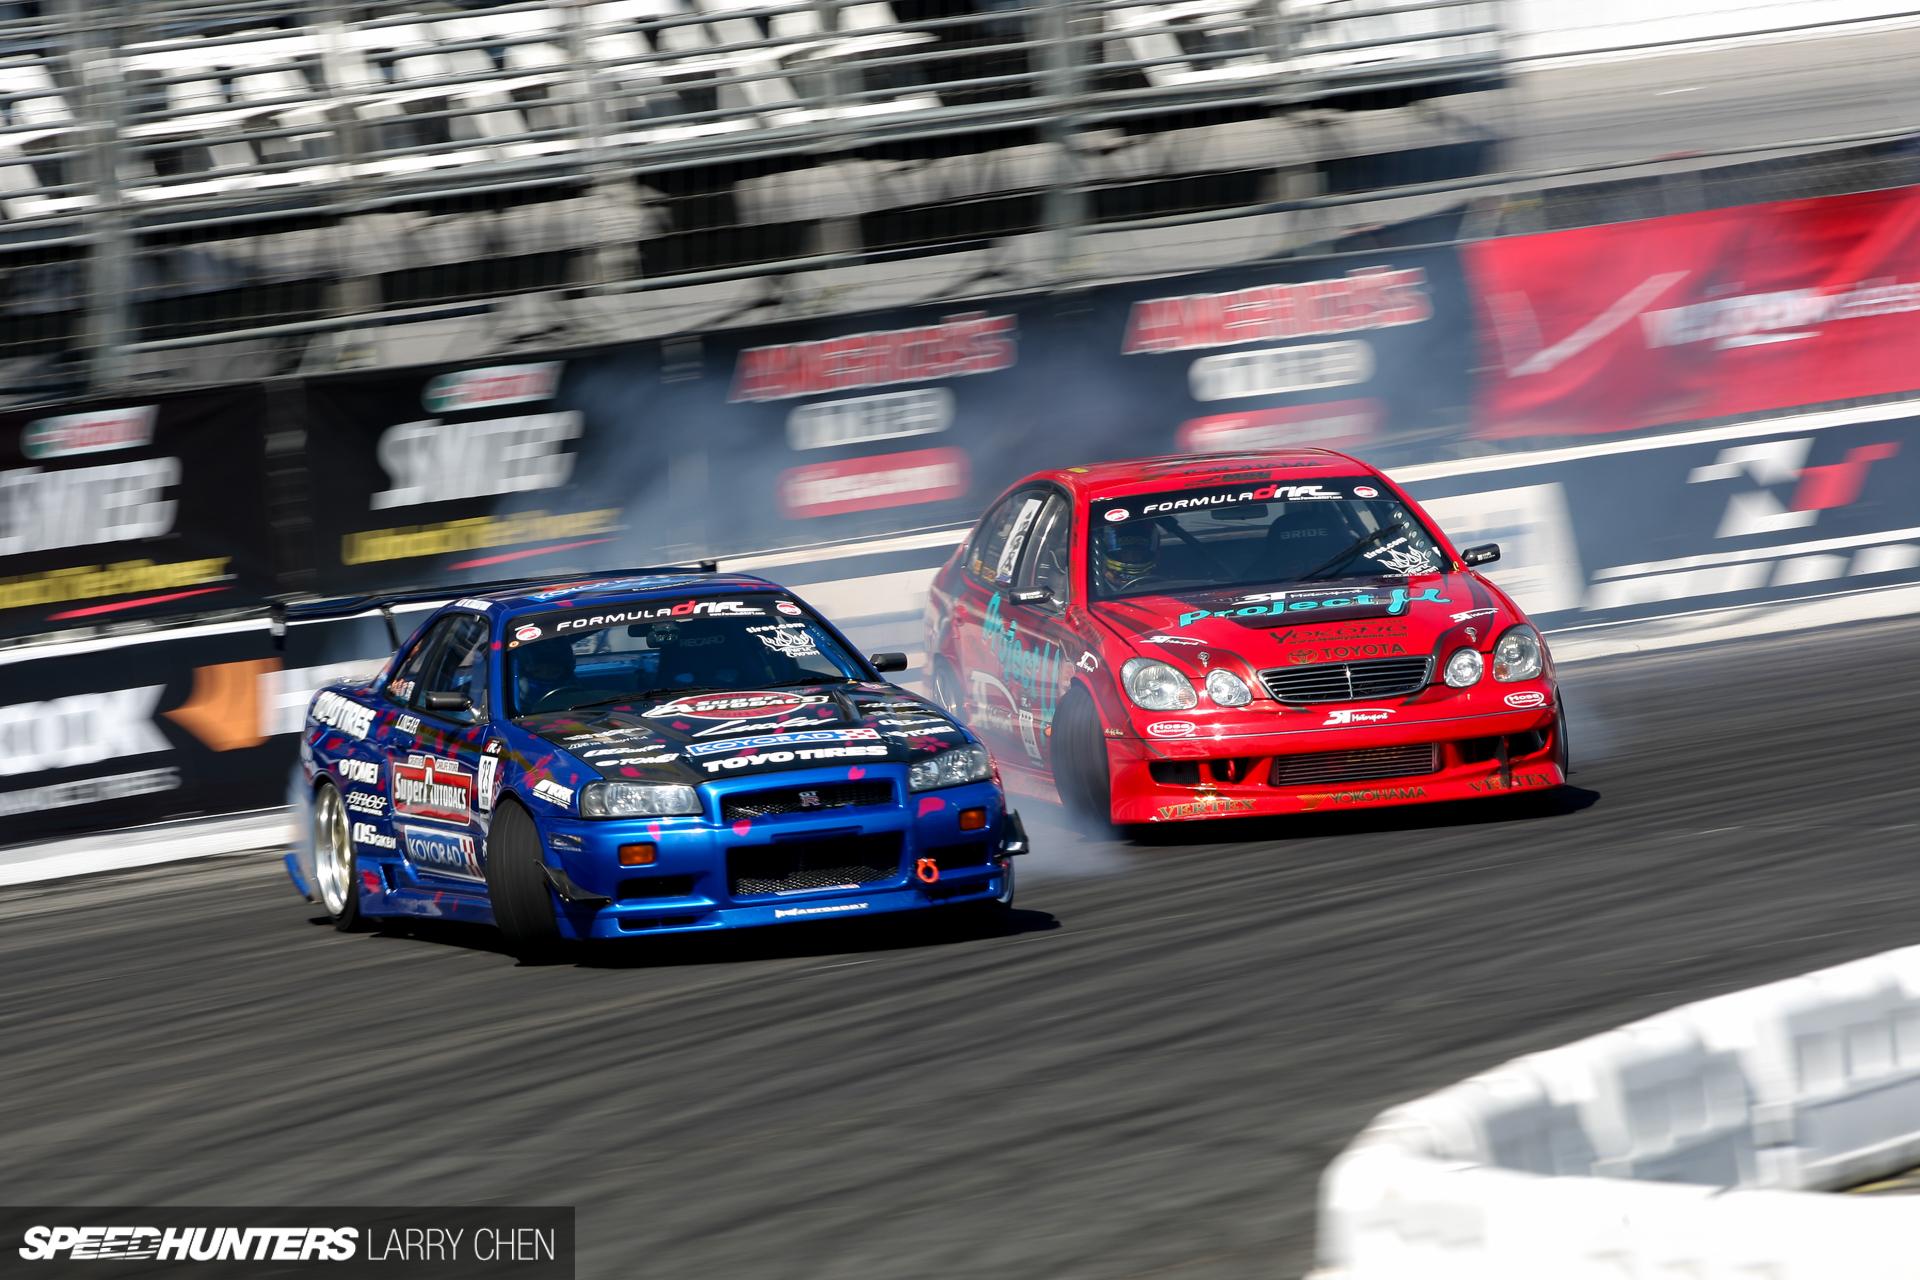 Best Car Drifting Wallpapers The Top 25 Liveries Of Formula Drift Speedhunters